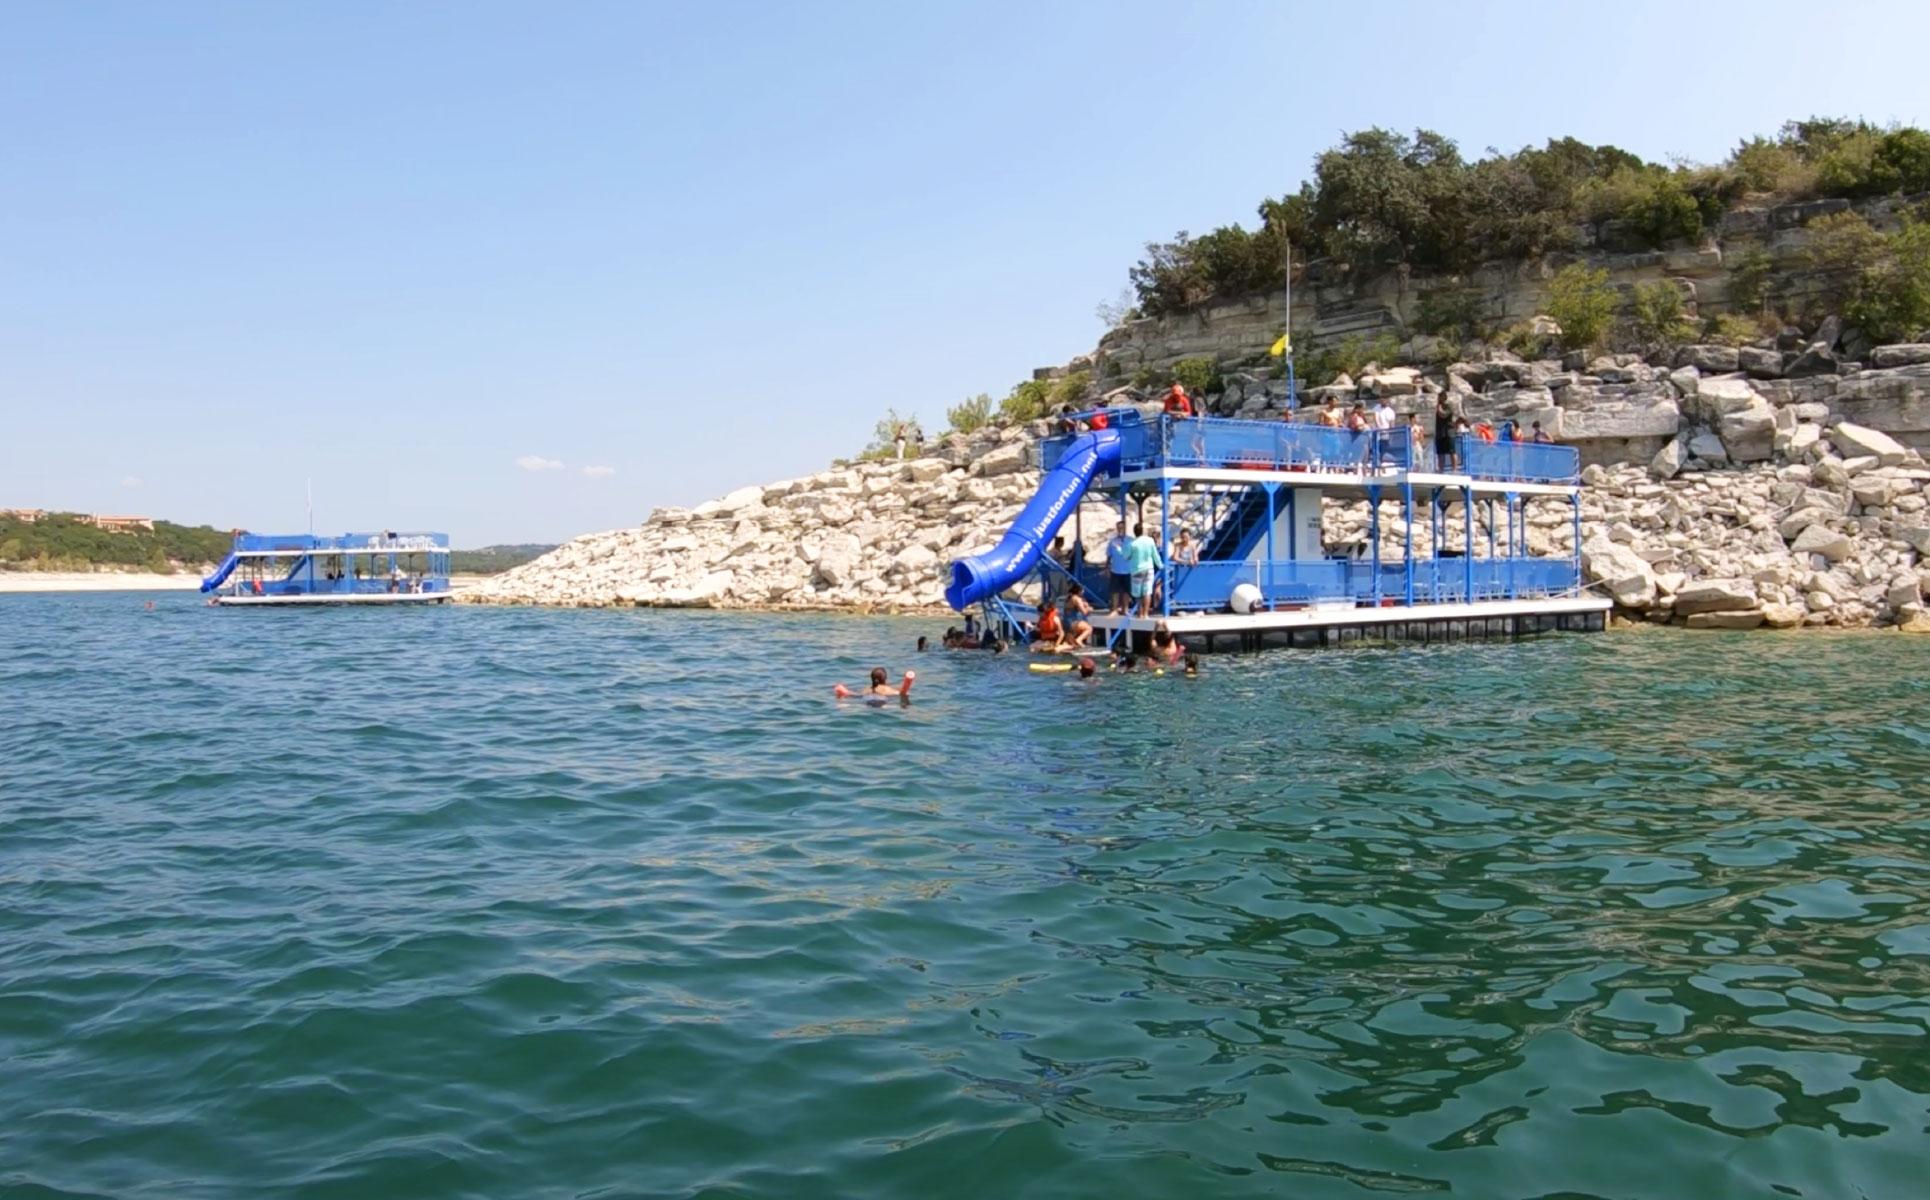 Party Barges — Just for Fun Watercraft Rental on Lake Travis